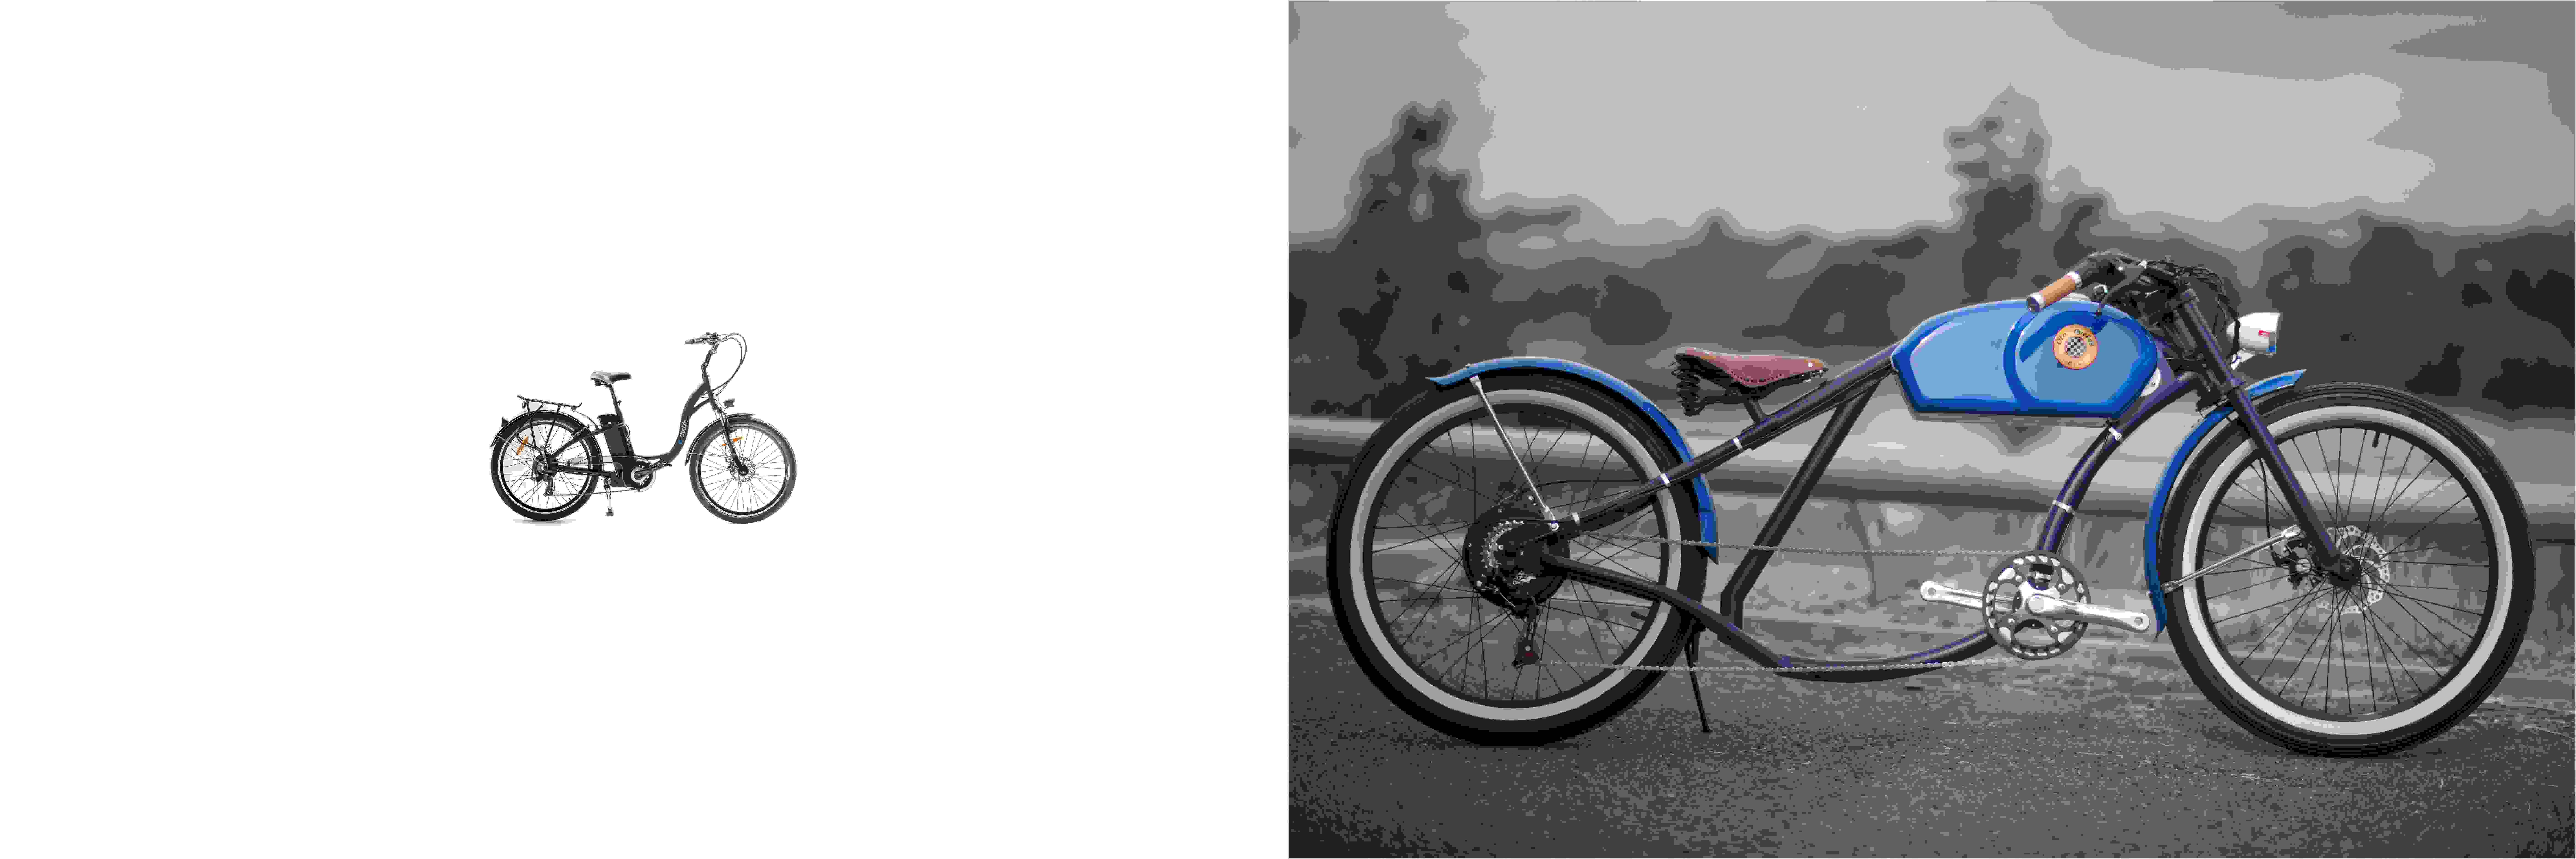 amazon bicicletas eléctricas